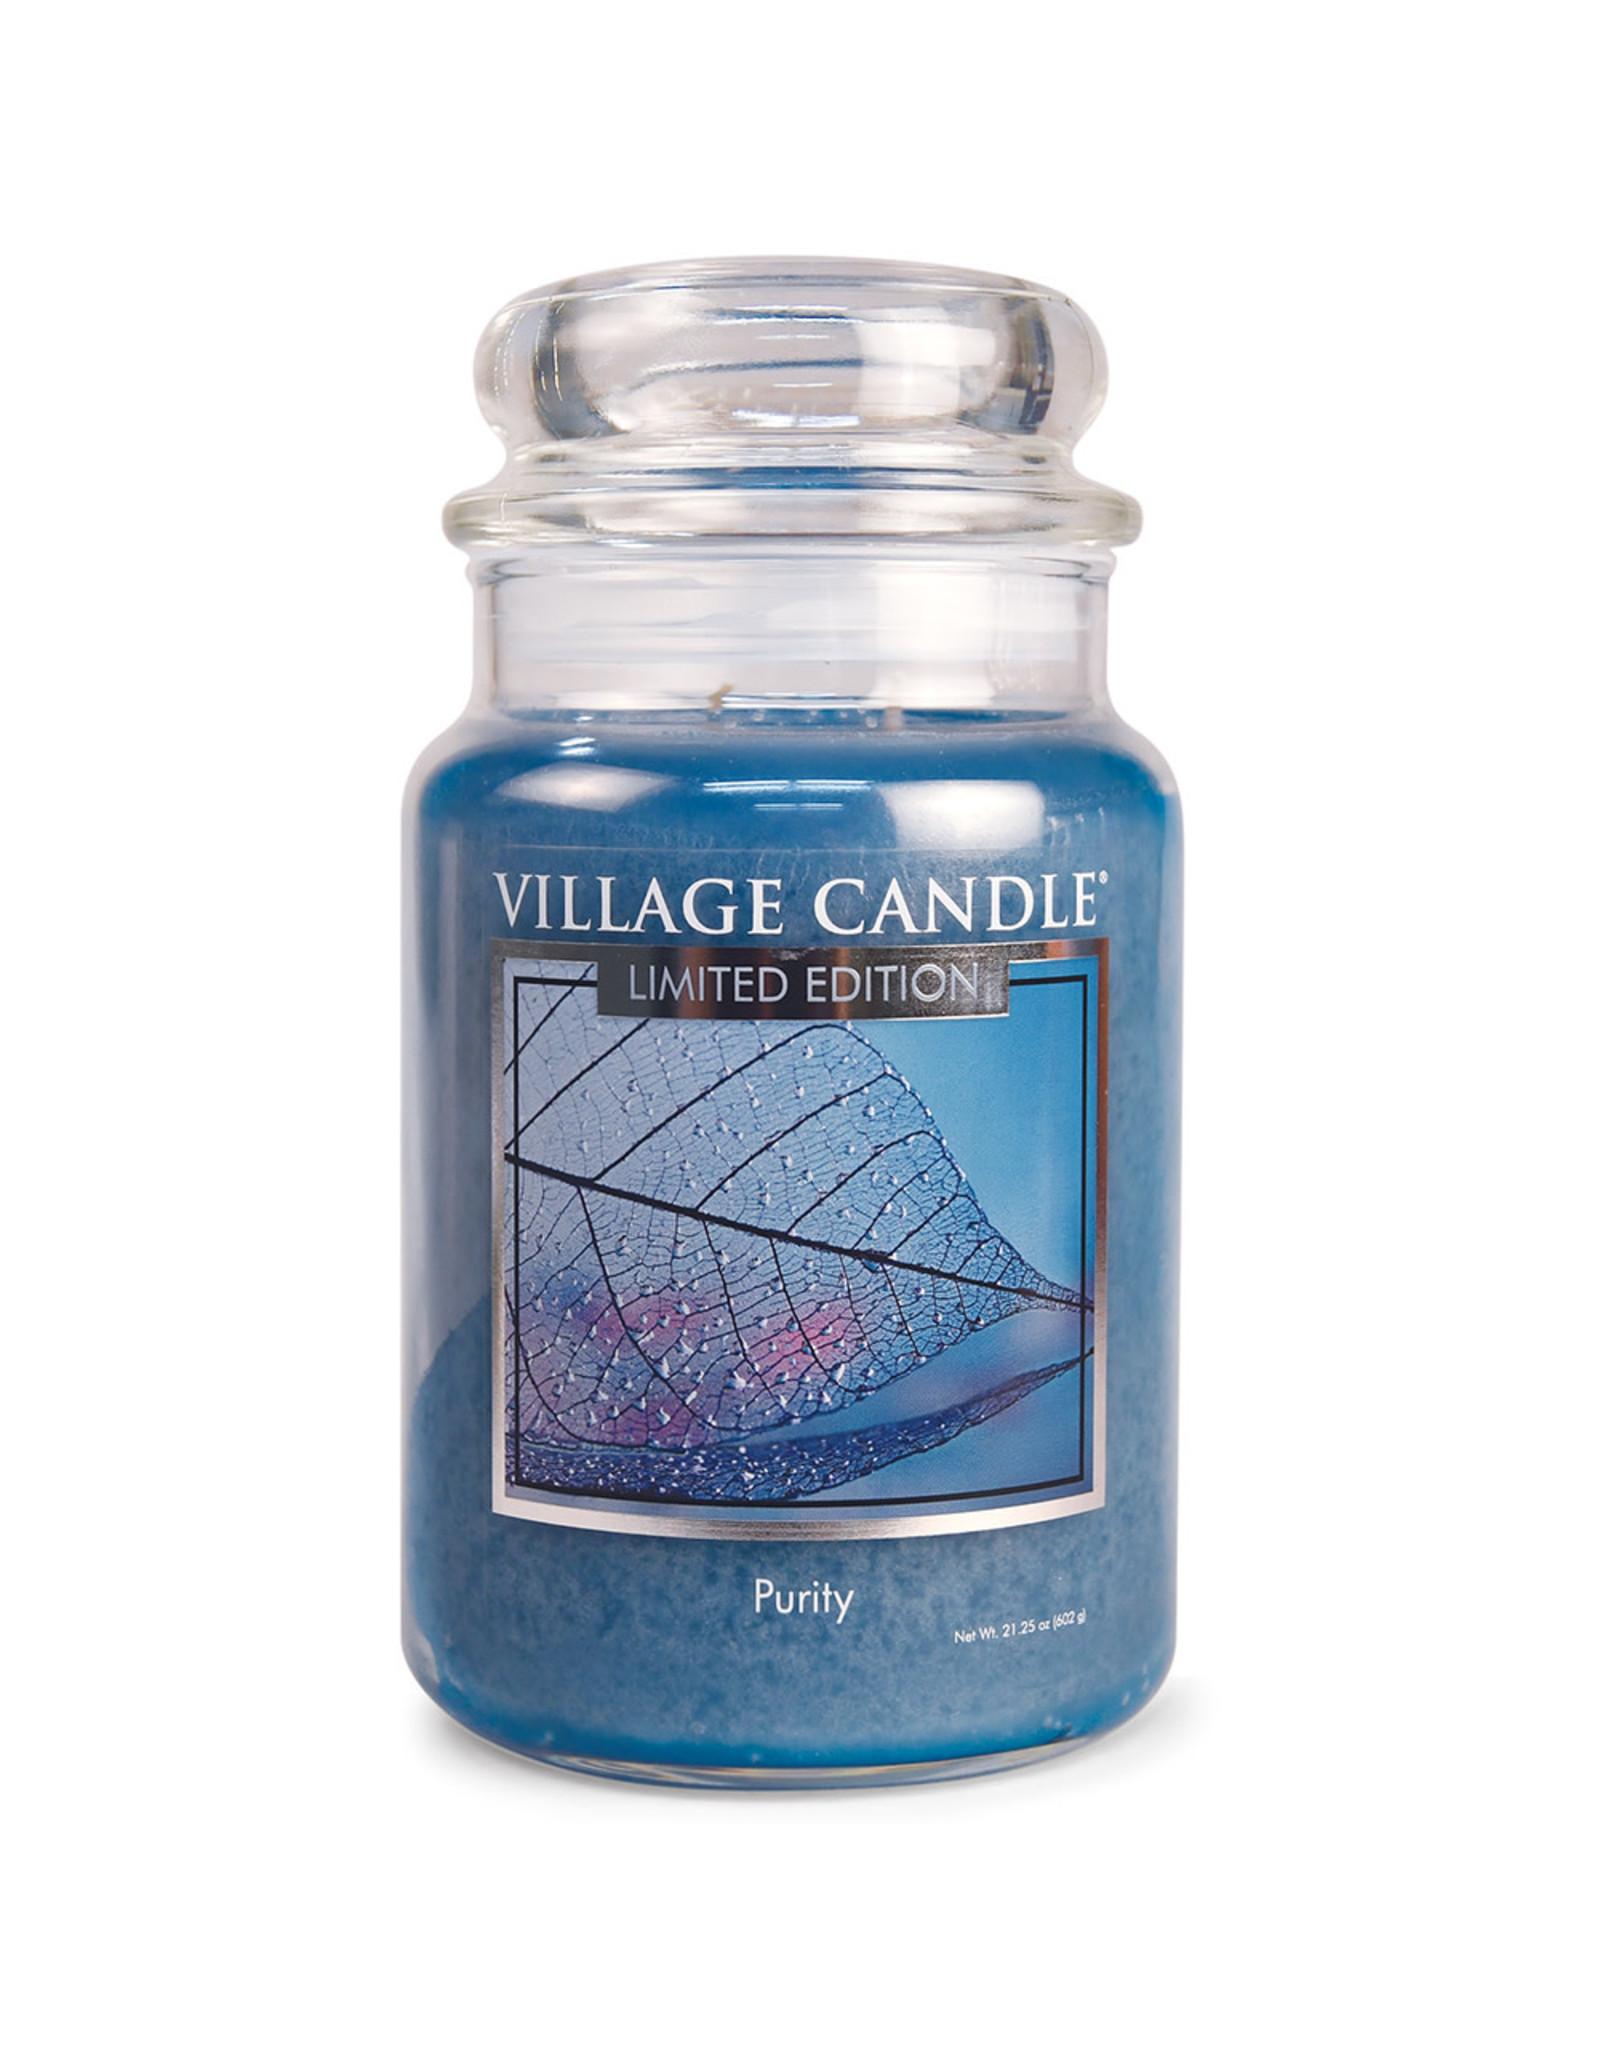 Village Candle PURITY LARGE JAR CANDLE